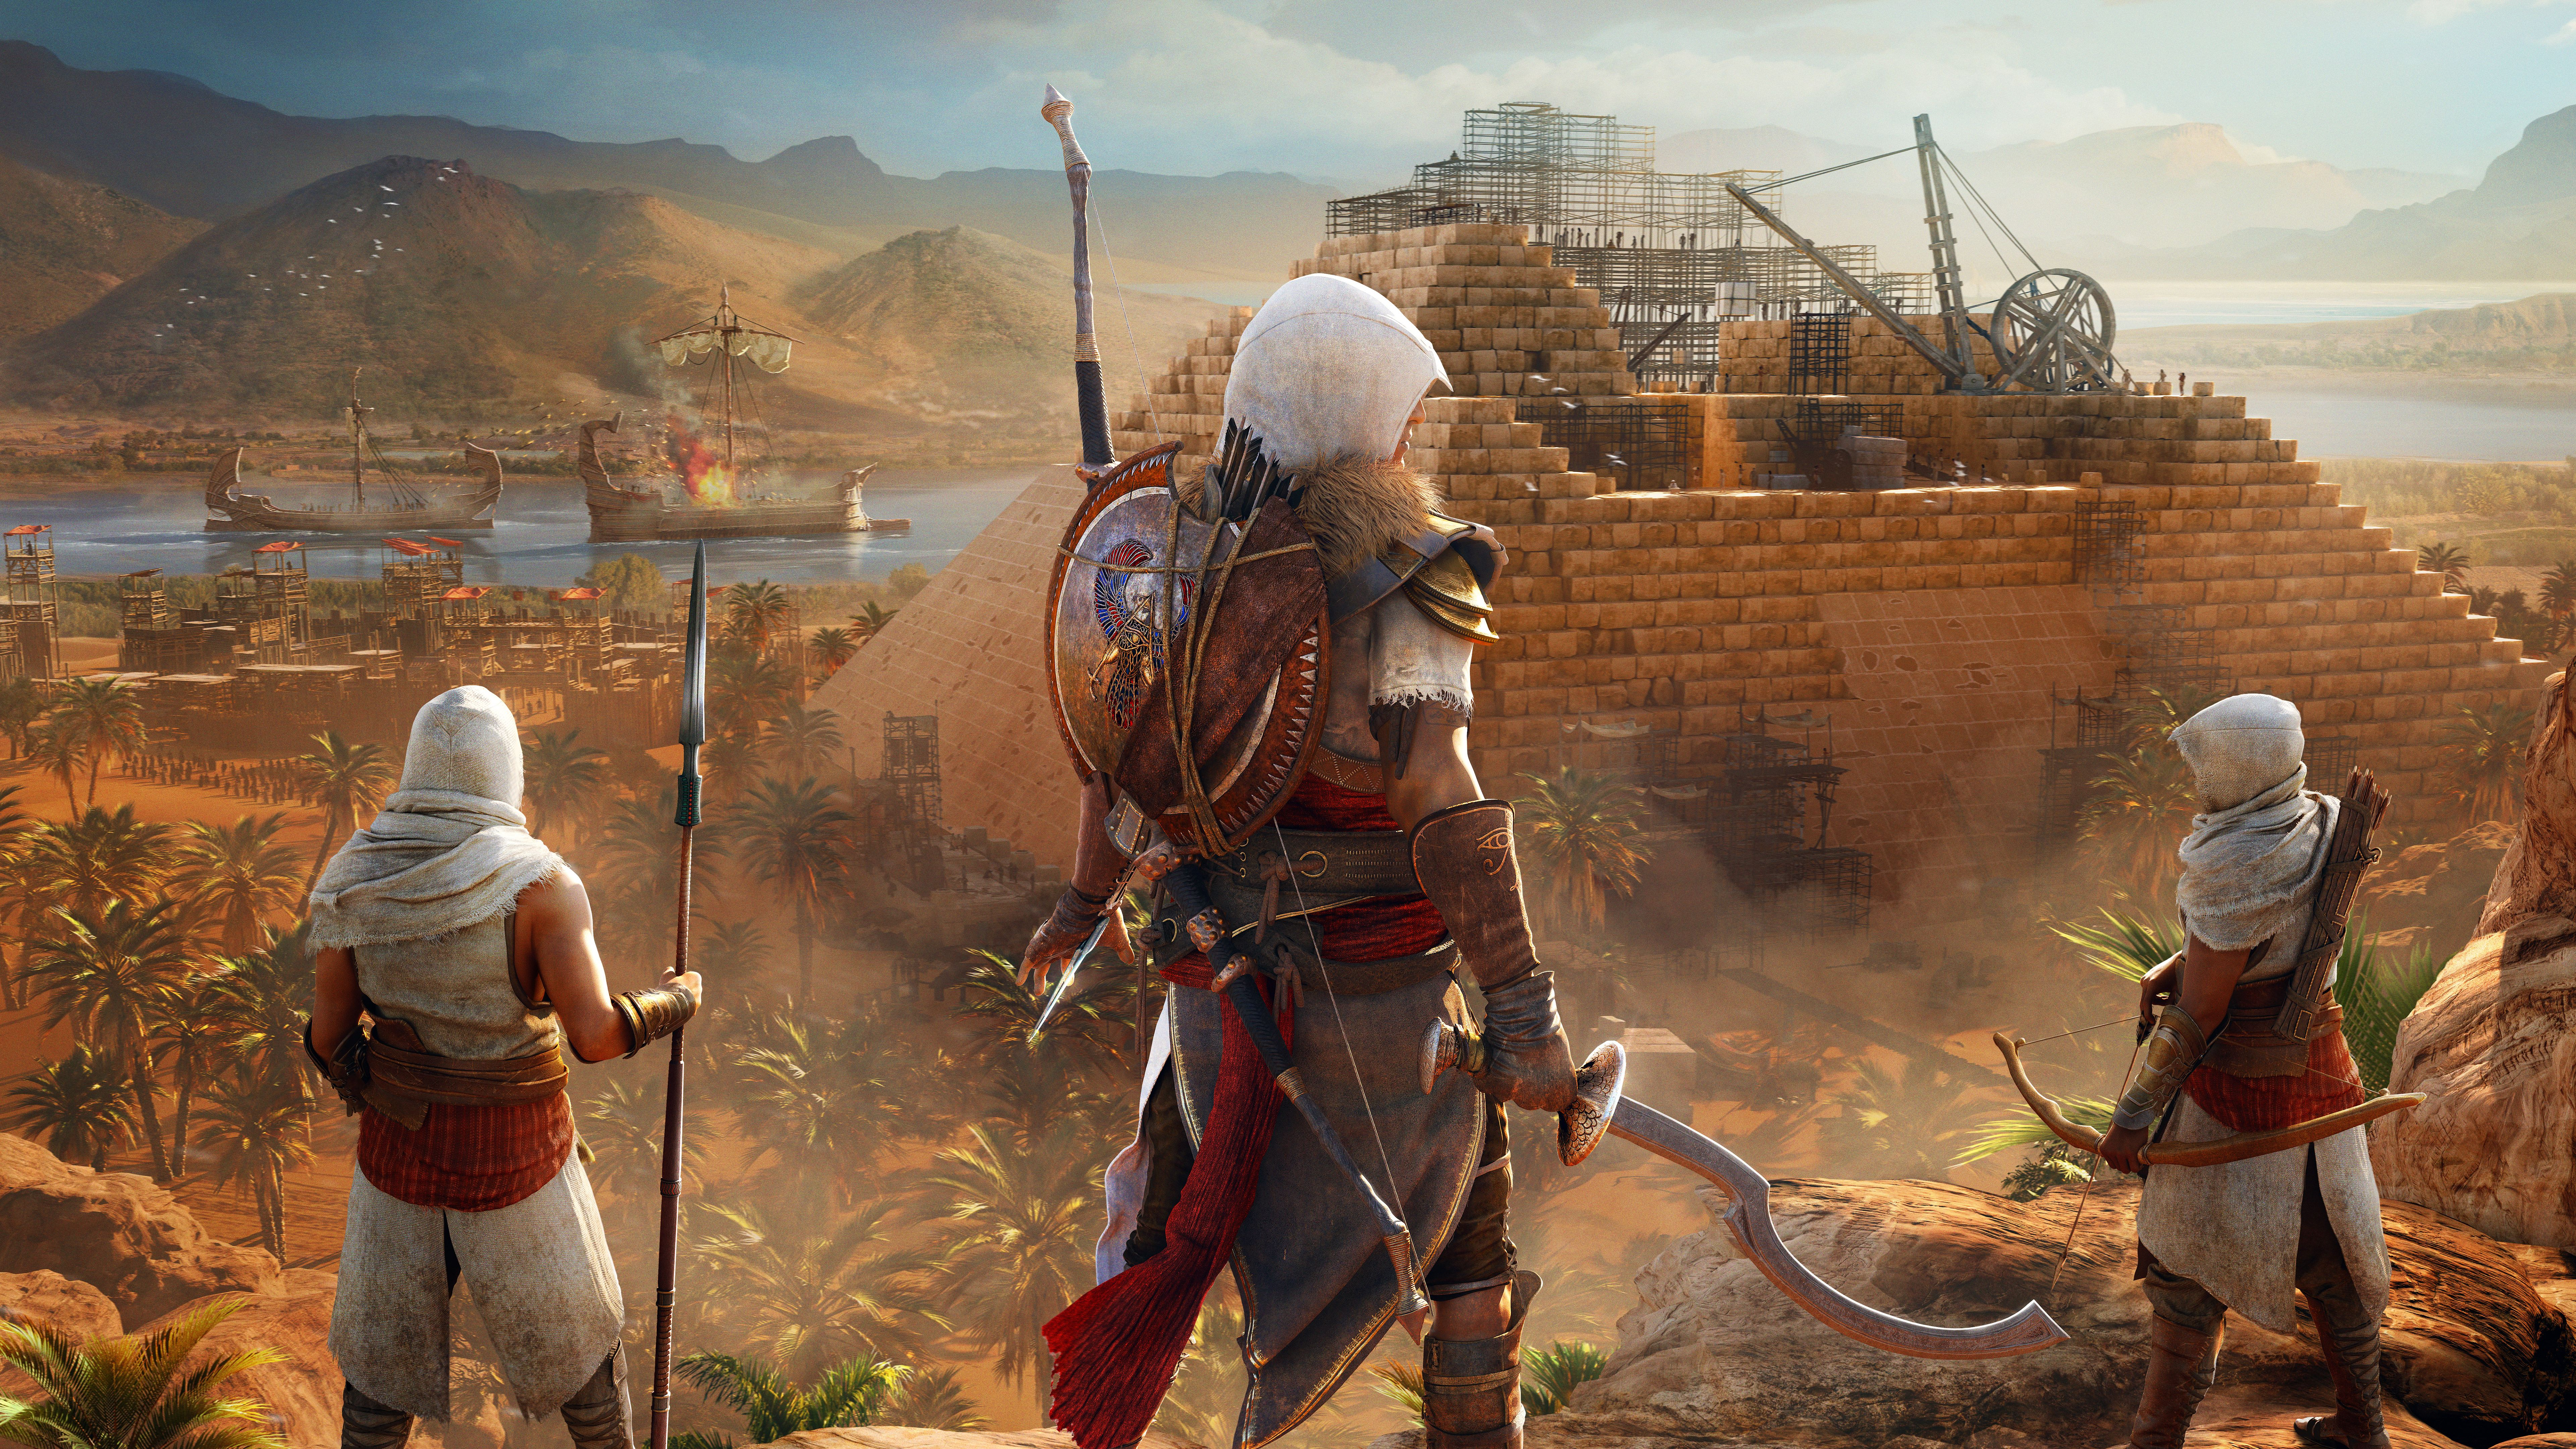 Assassins Creed Origins The Hidden Ones 4k 8k 4k Hd Wallpapers Assassins Creed Origins Assassins Creed Assassins Creed Game